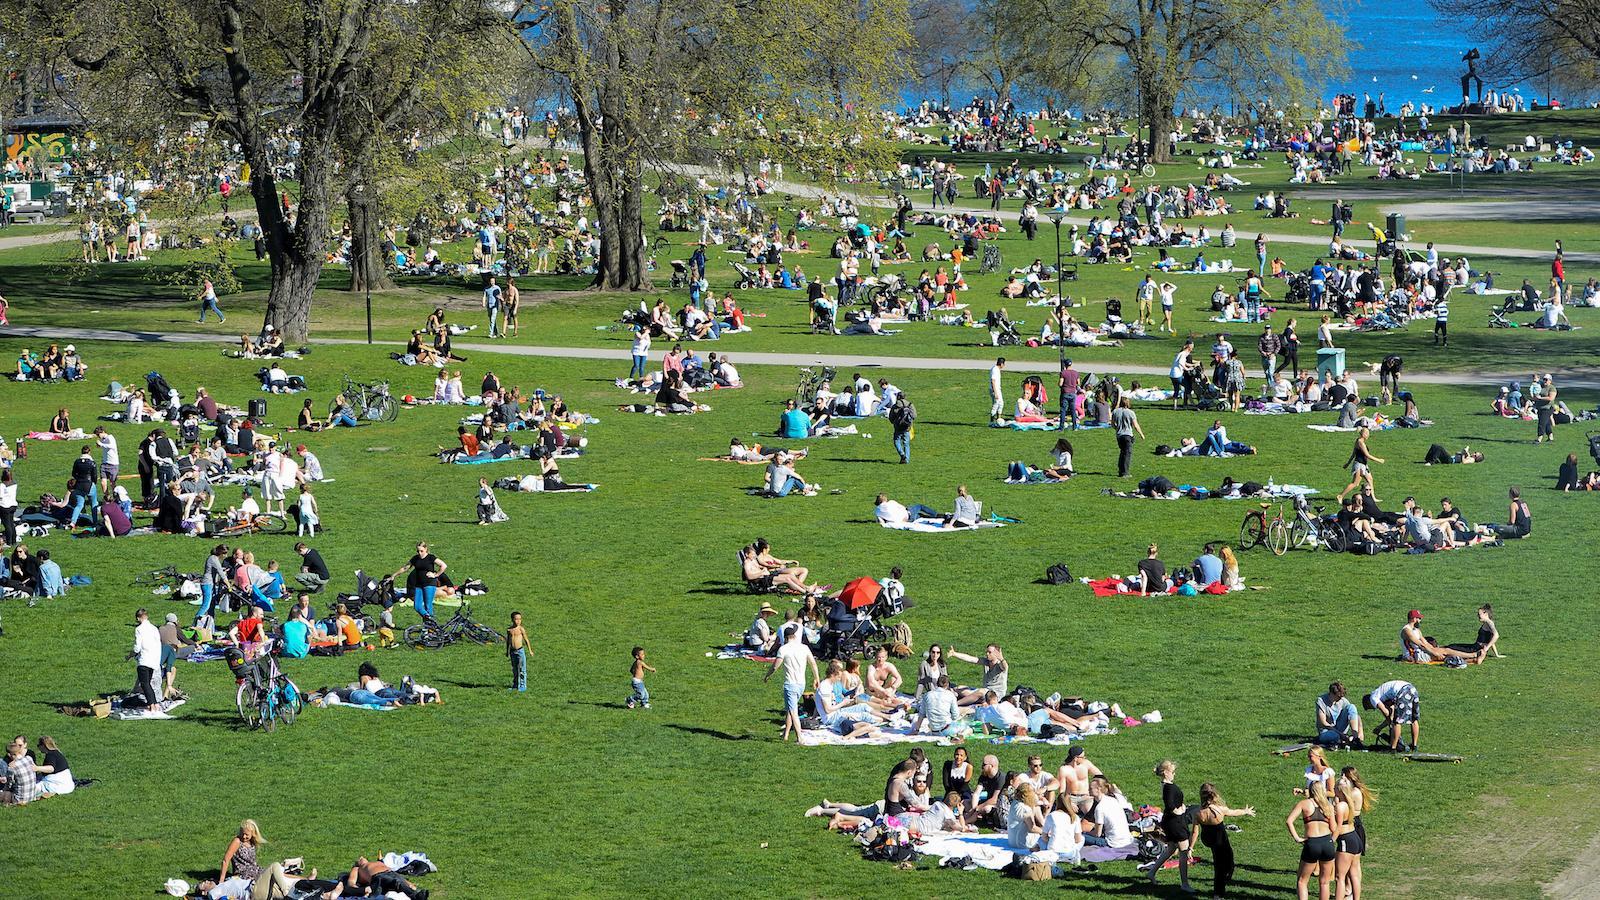 New York City's Central Park in the springtime.